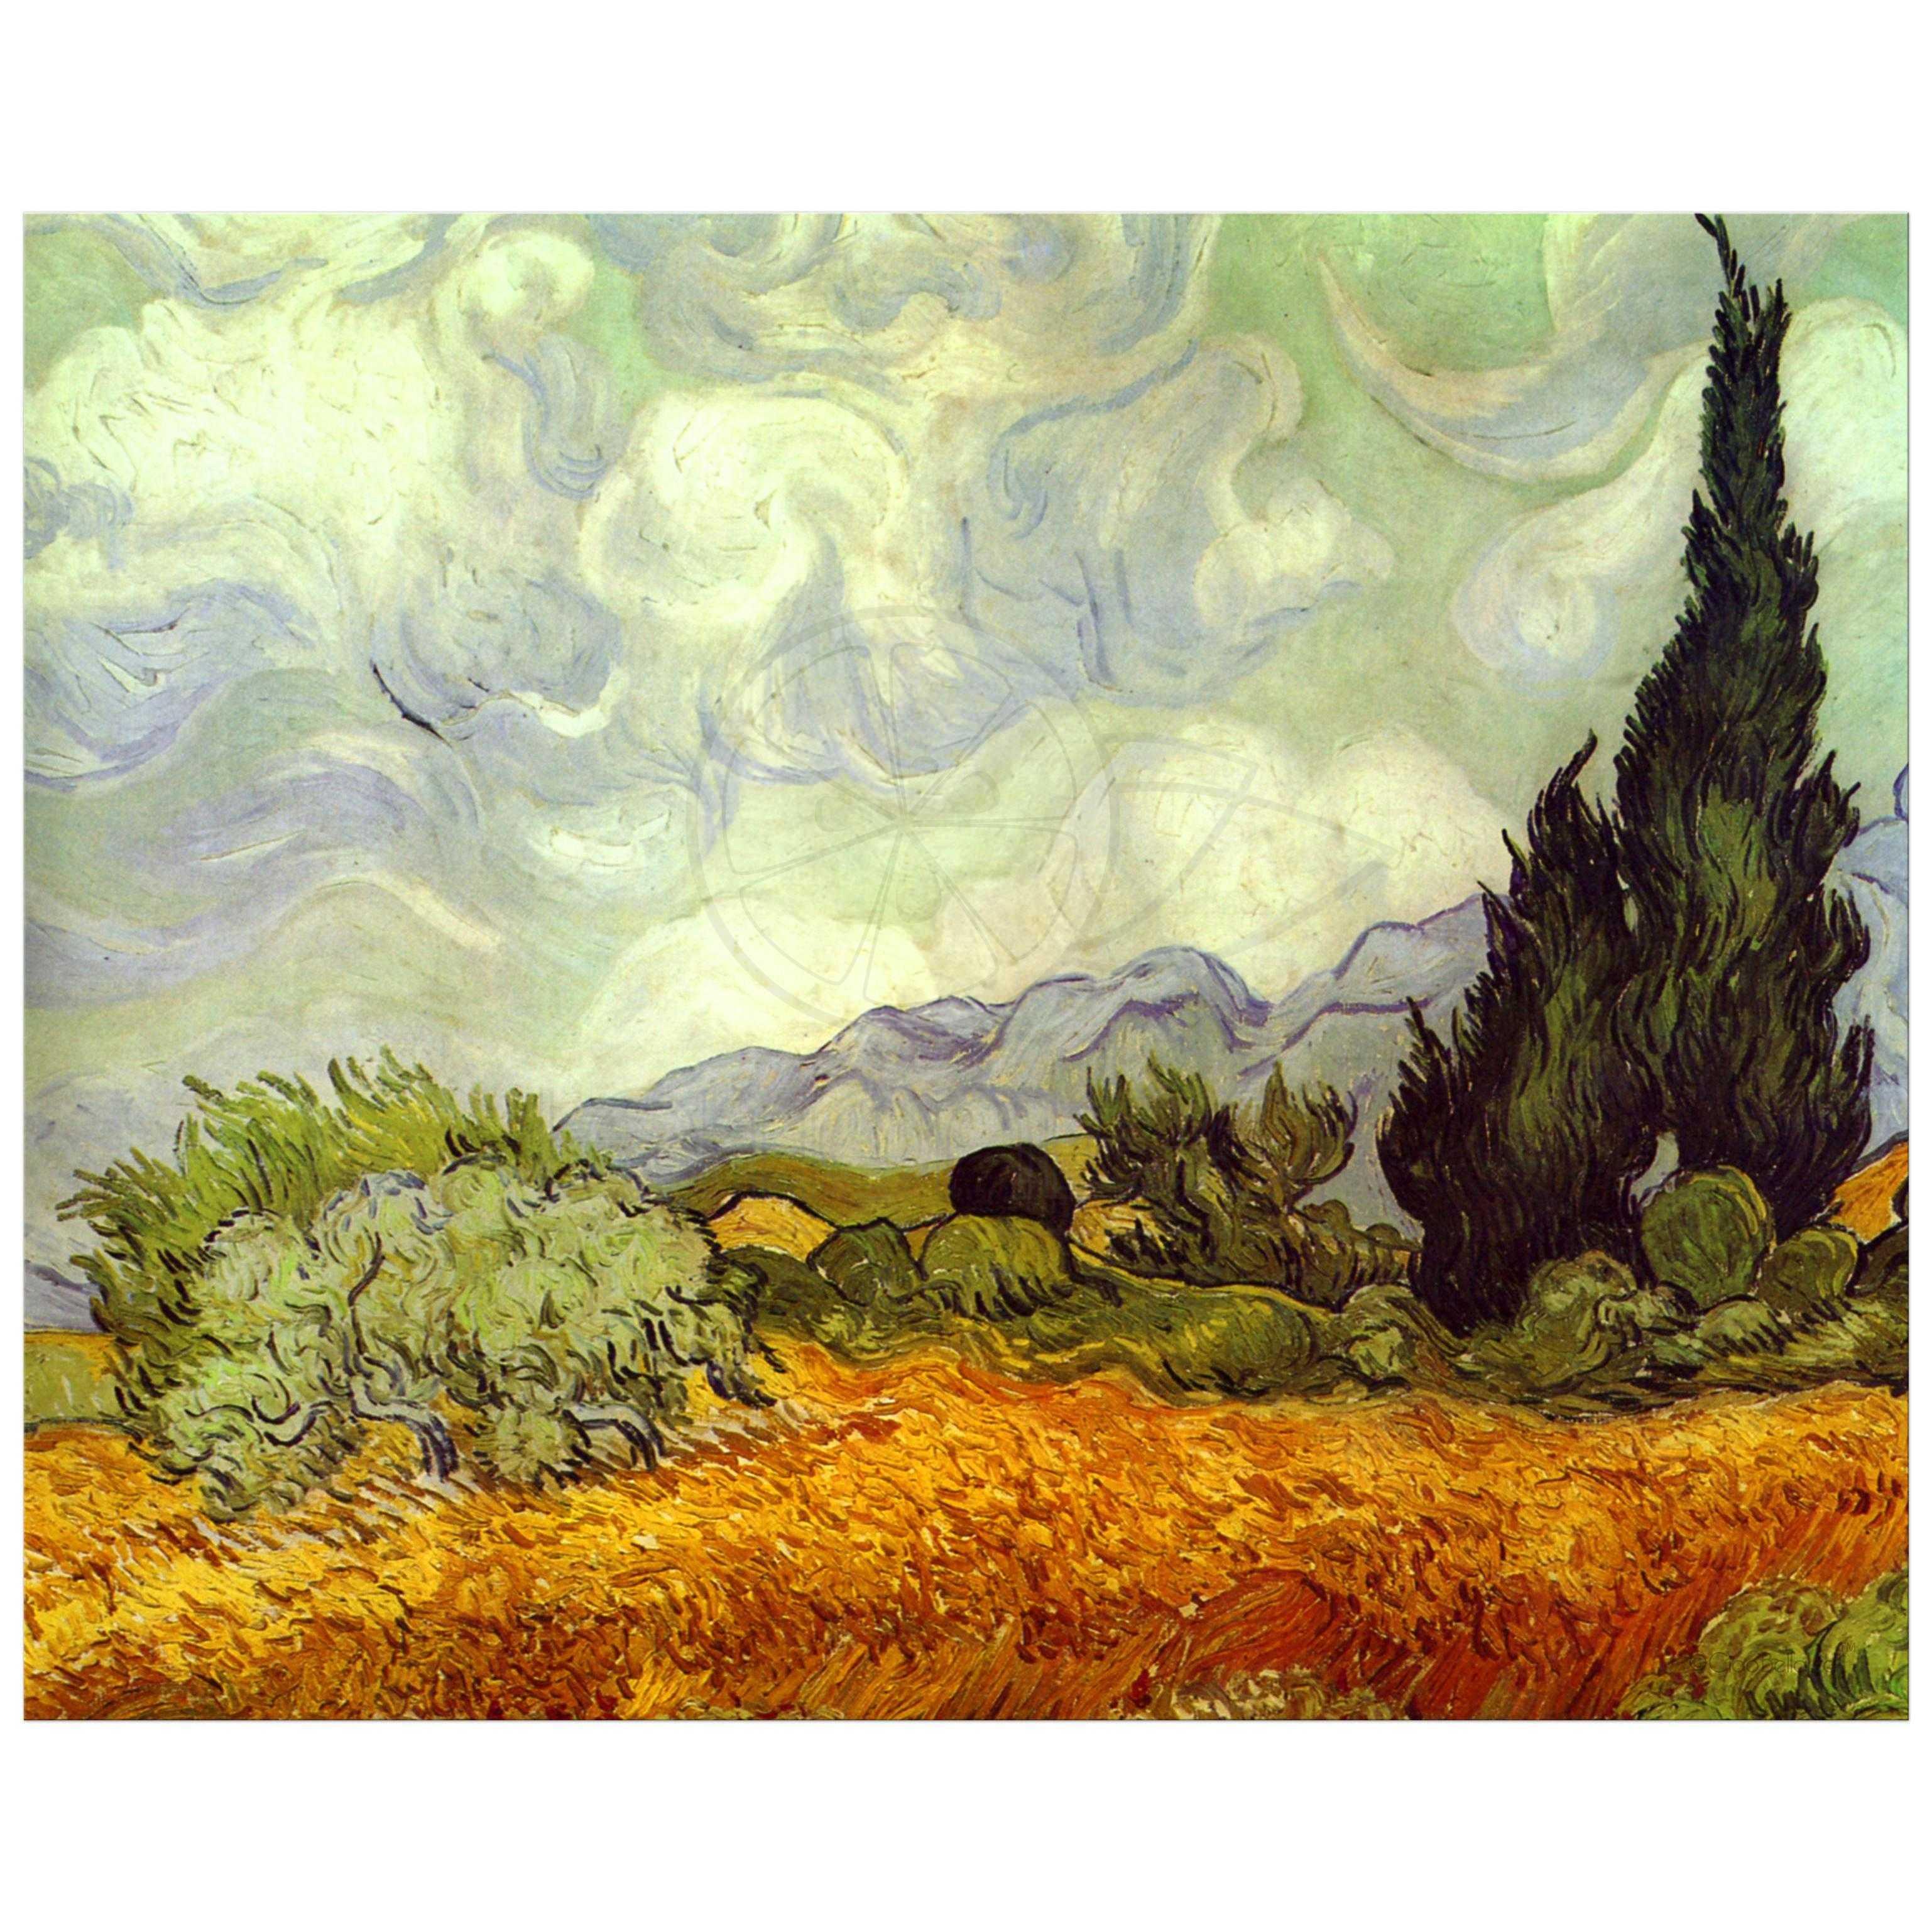 VINCENT VAN GOGH CYPRESS TREES LANDSCAPE PAINTING 8X10 REAL CANVAS ART PRINT